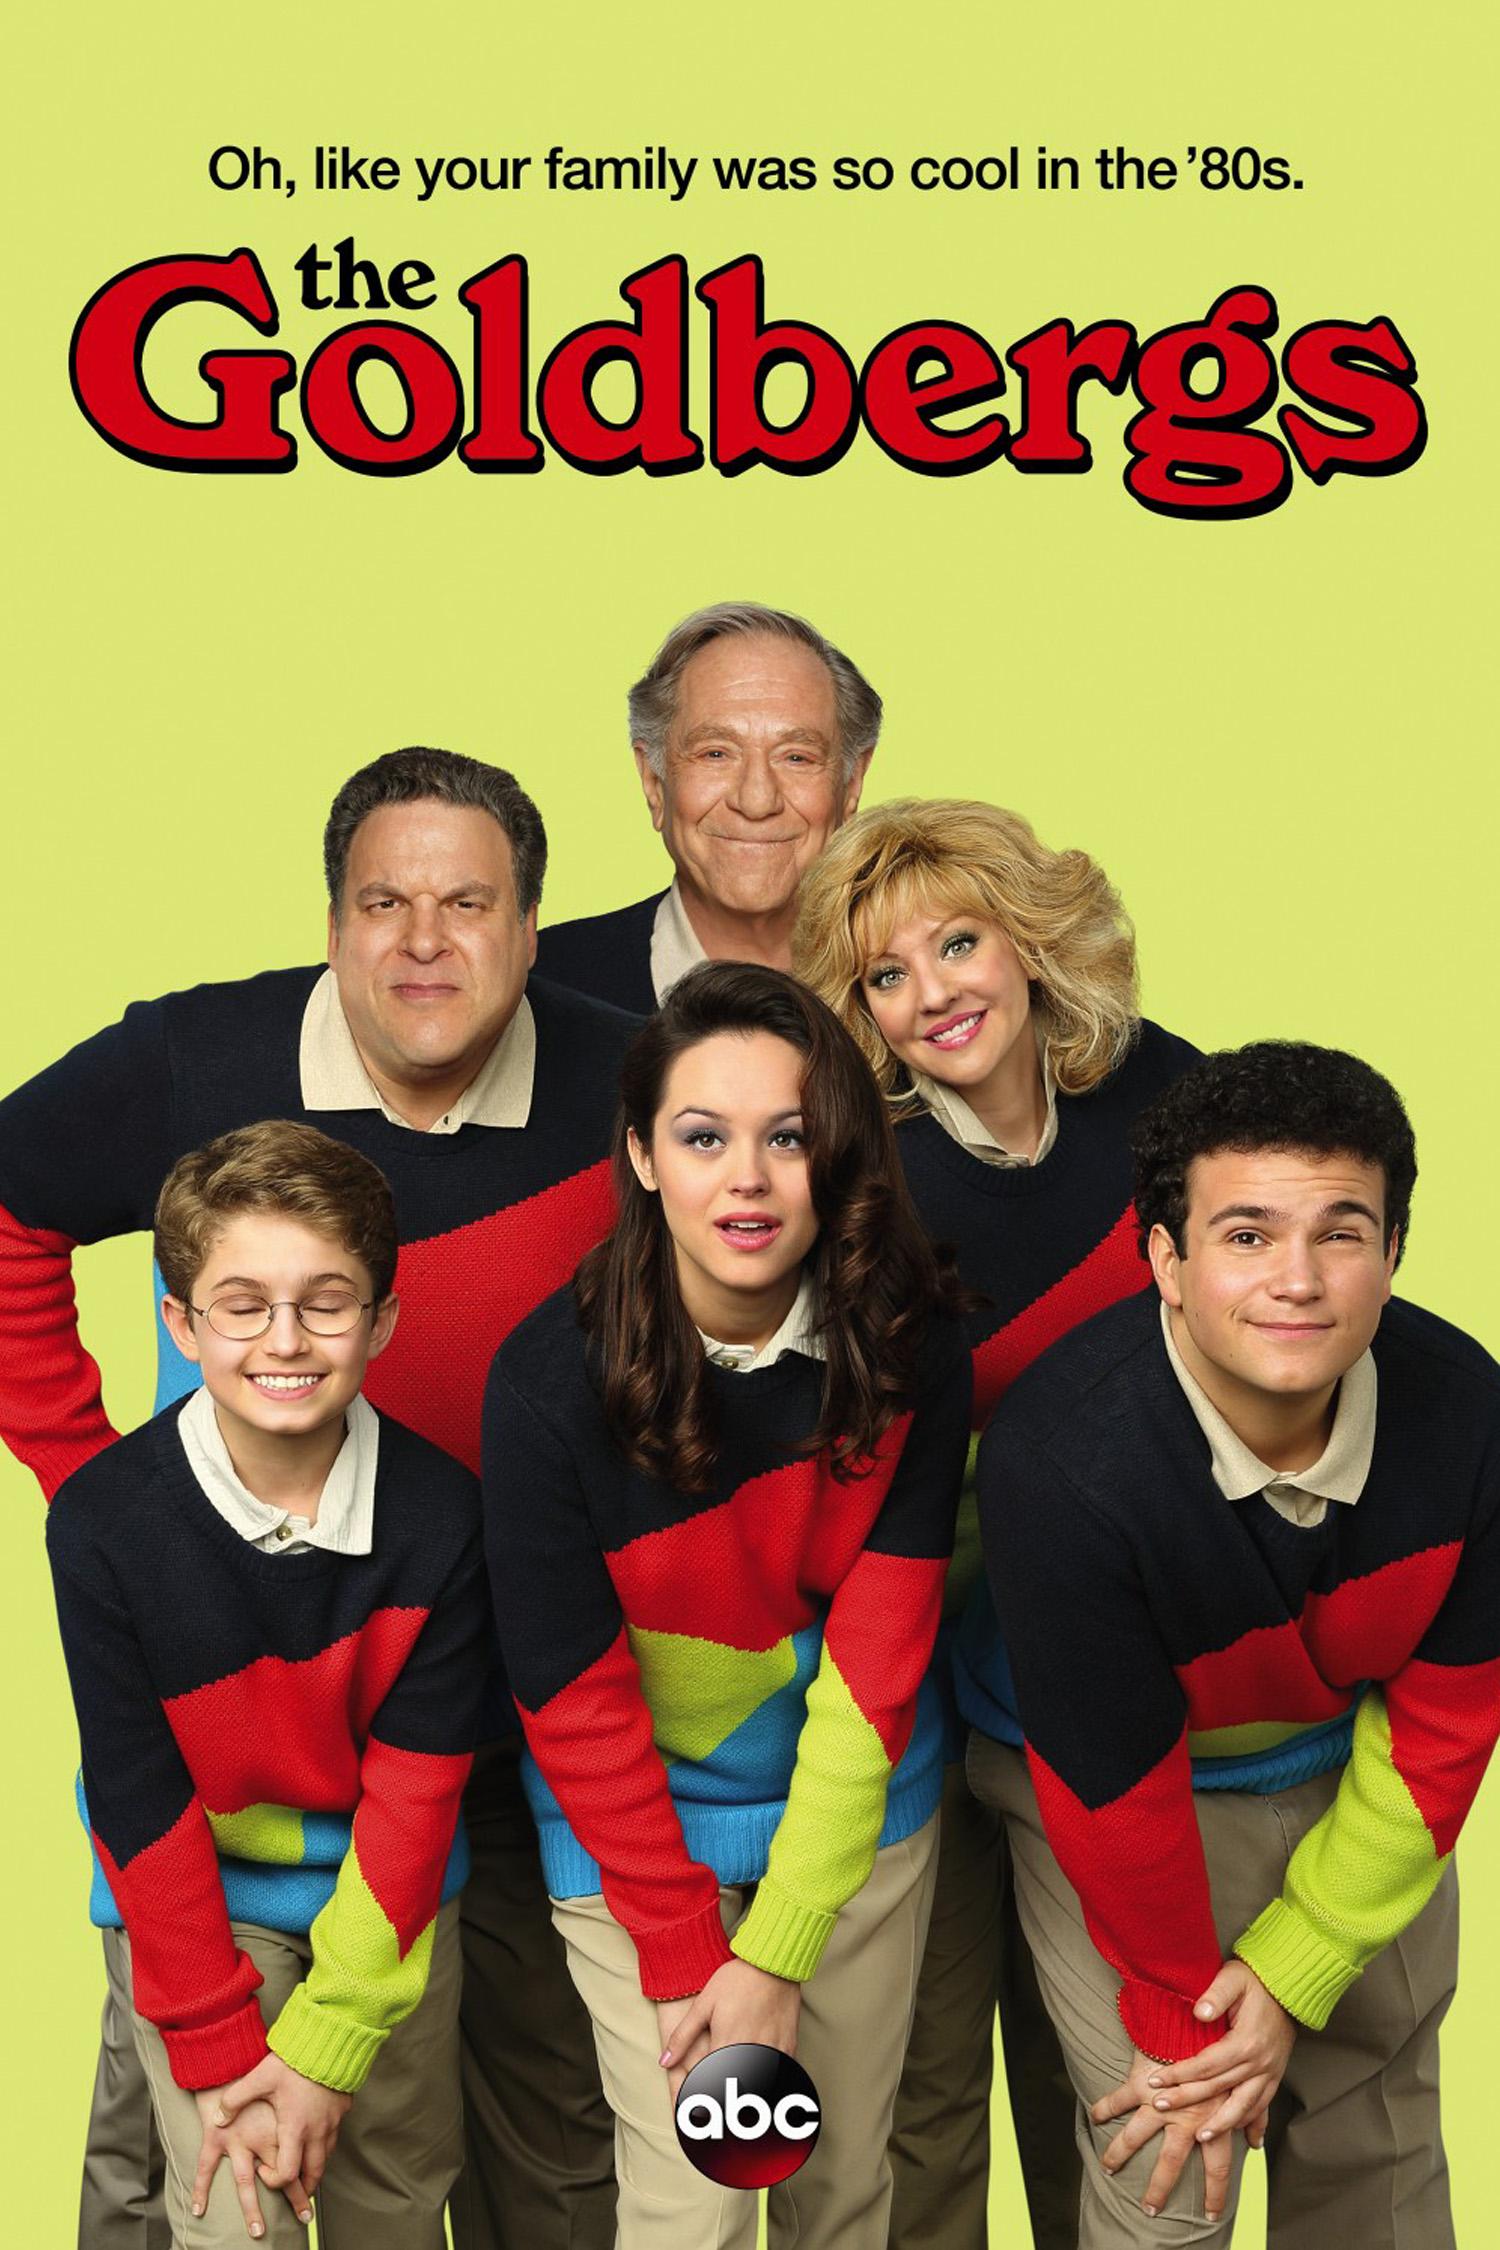 THE GOLDBERGS   TV Series, Comedy (Season 1-2)  ABC Studios/Sony Pictures Ent.  Producers - Adam Goldberg, Doug Robinson, Seth Gordon  Additional Editor - Waldemar Centeno